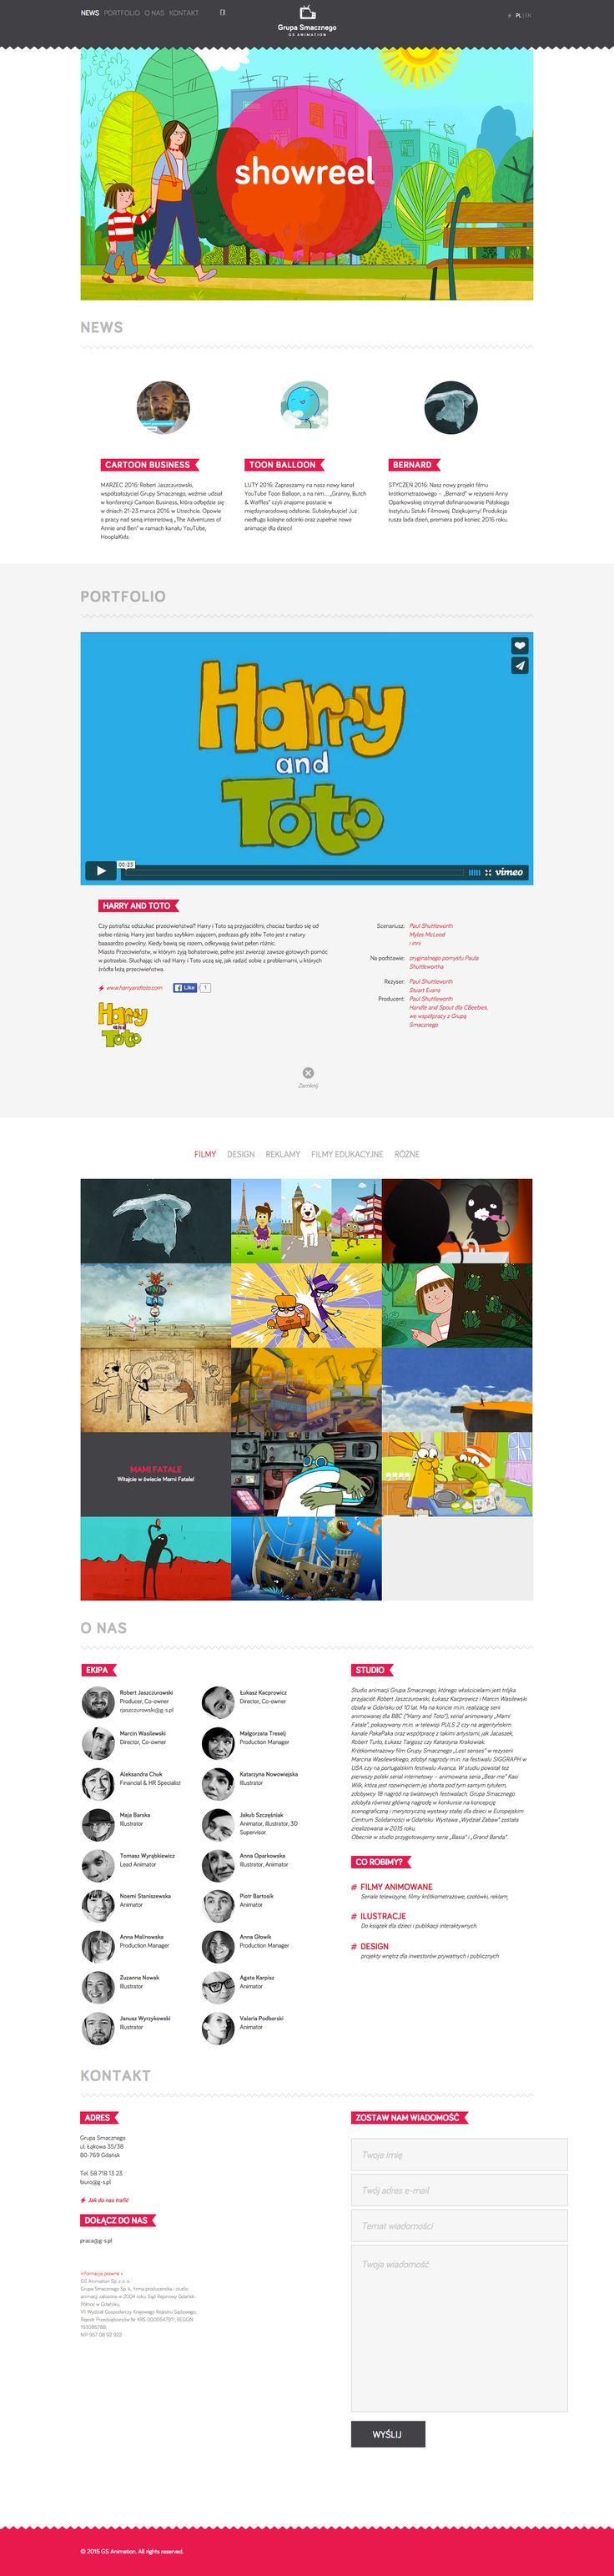 GS Animation website